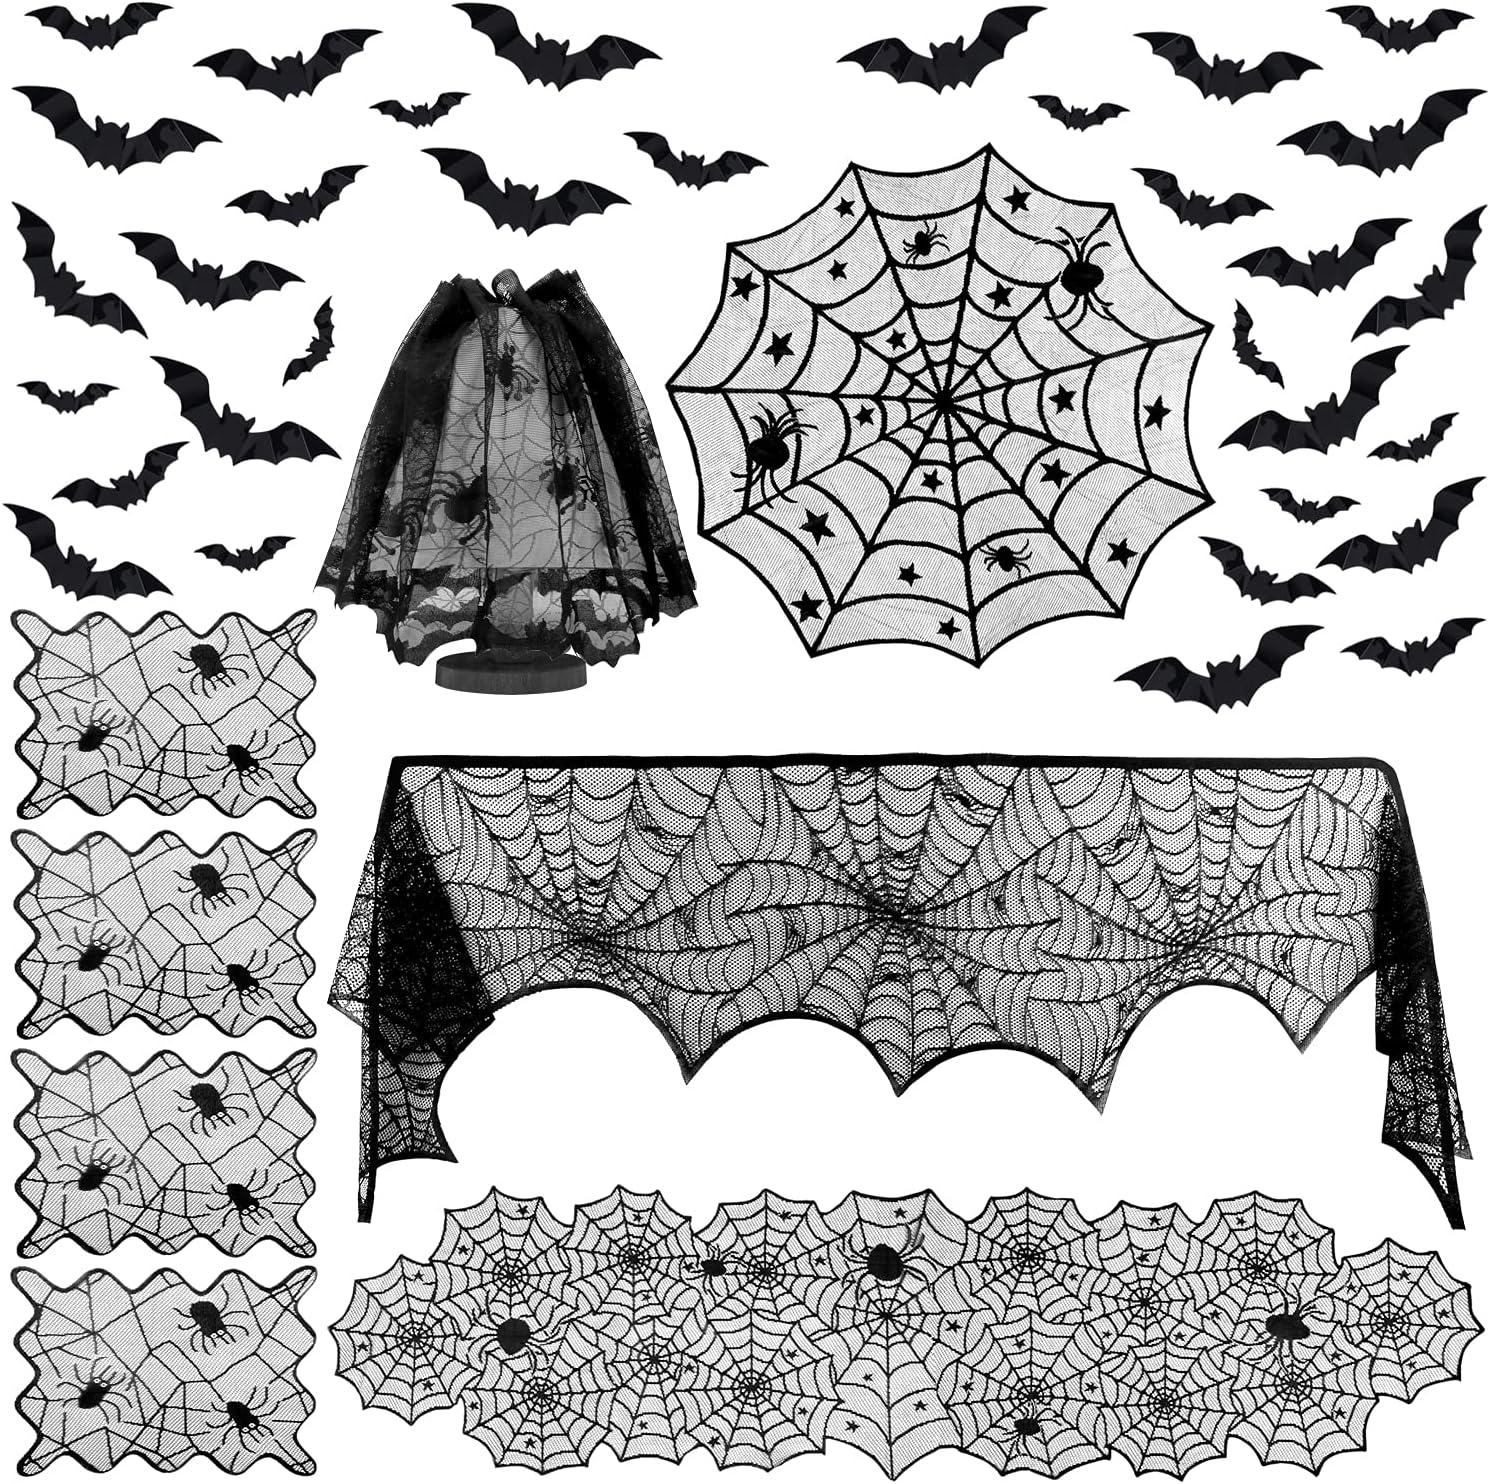 Colovis Halloween Decorations Set Include Lace Fireplace Mantel